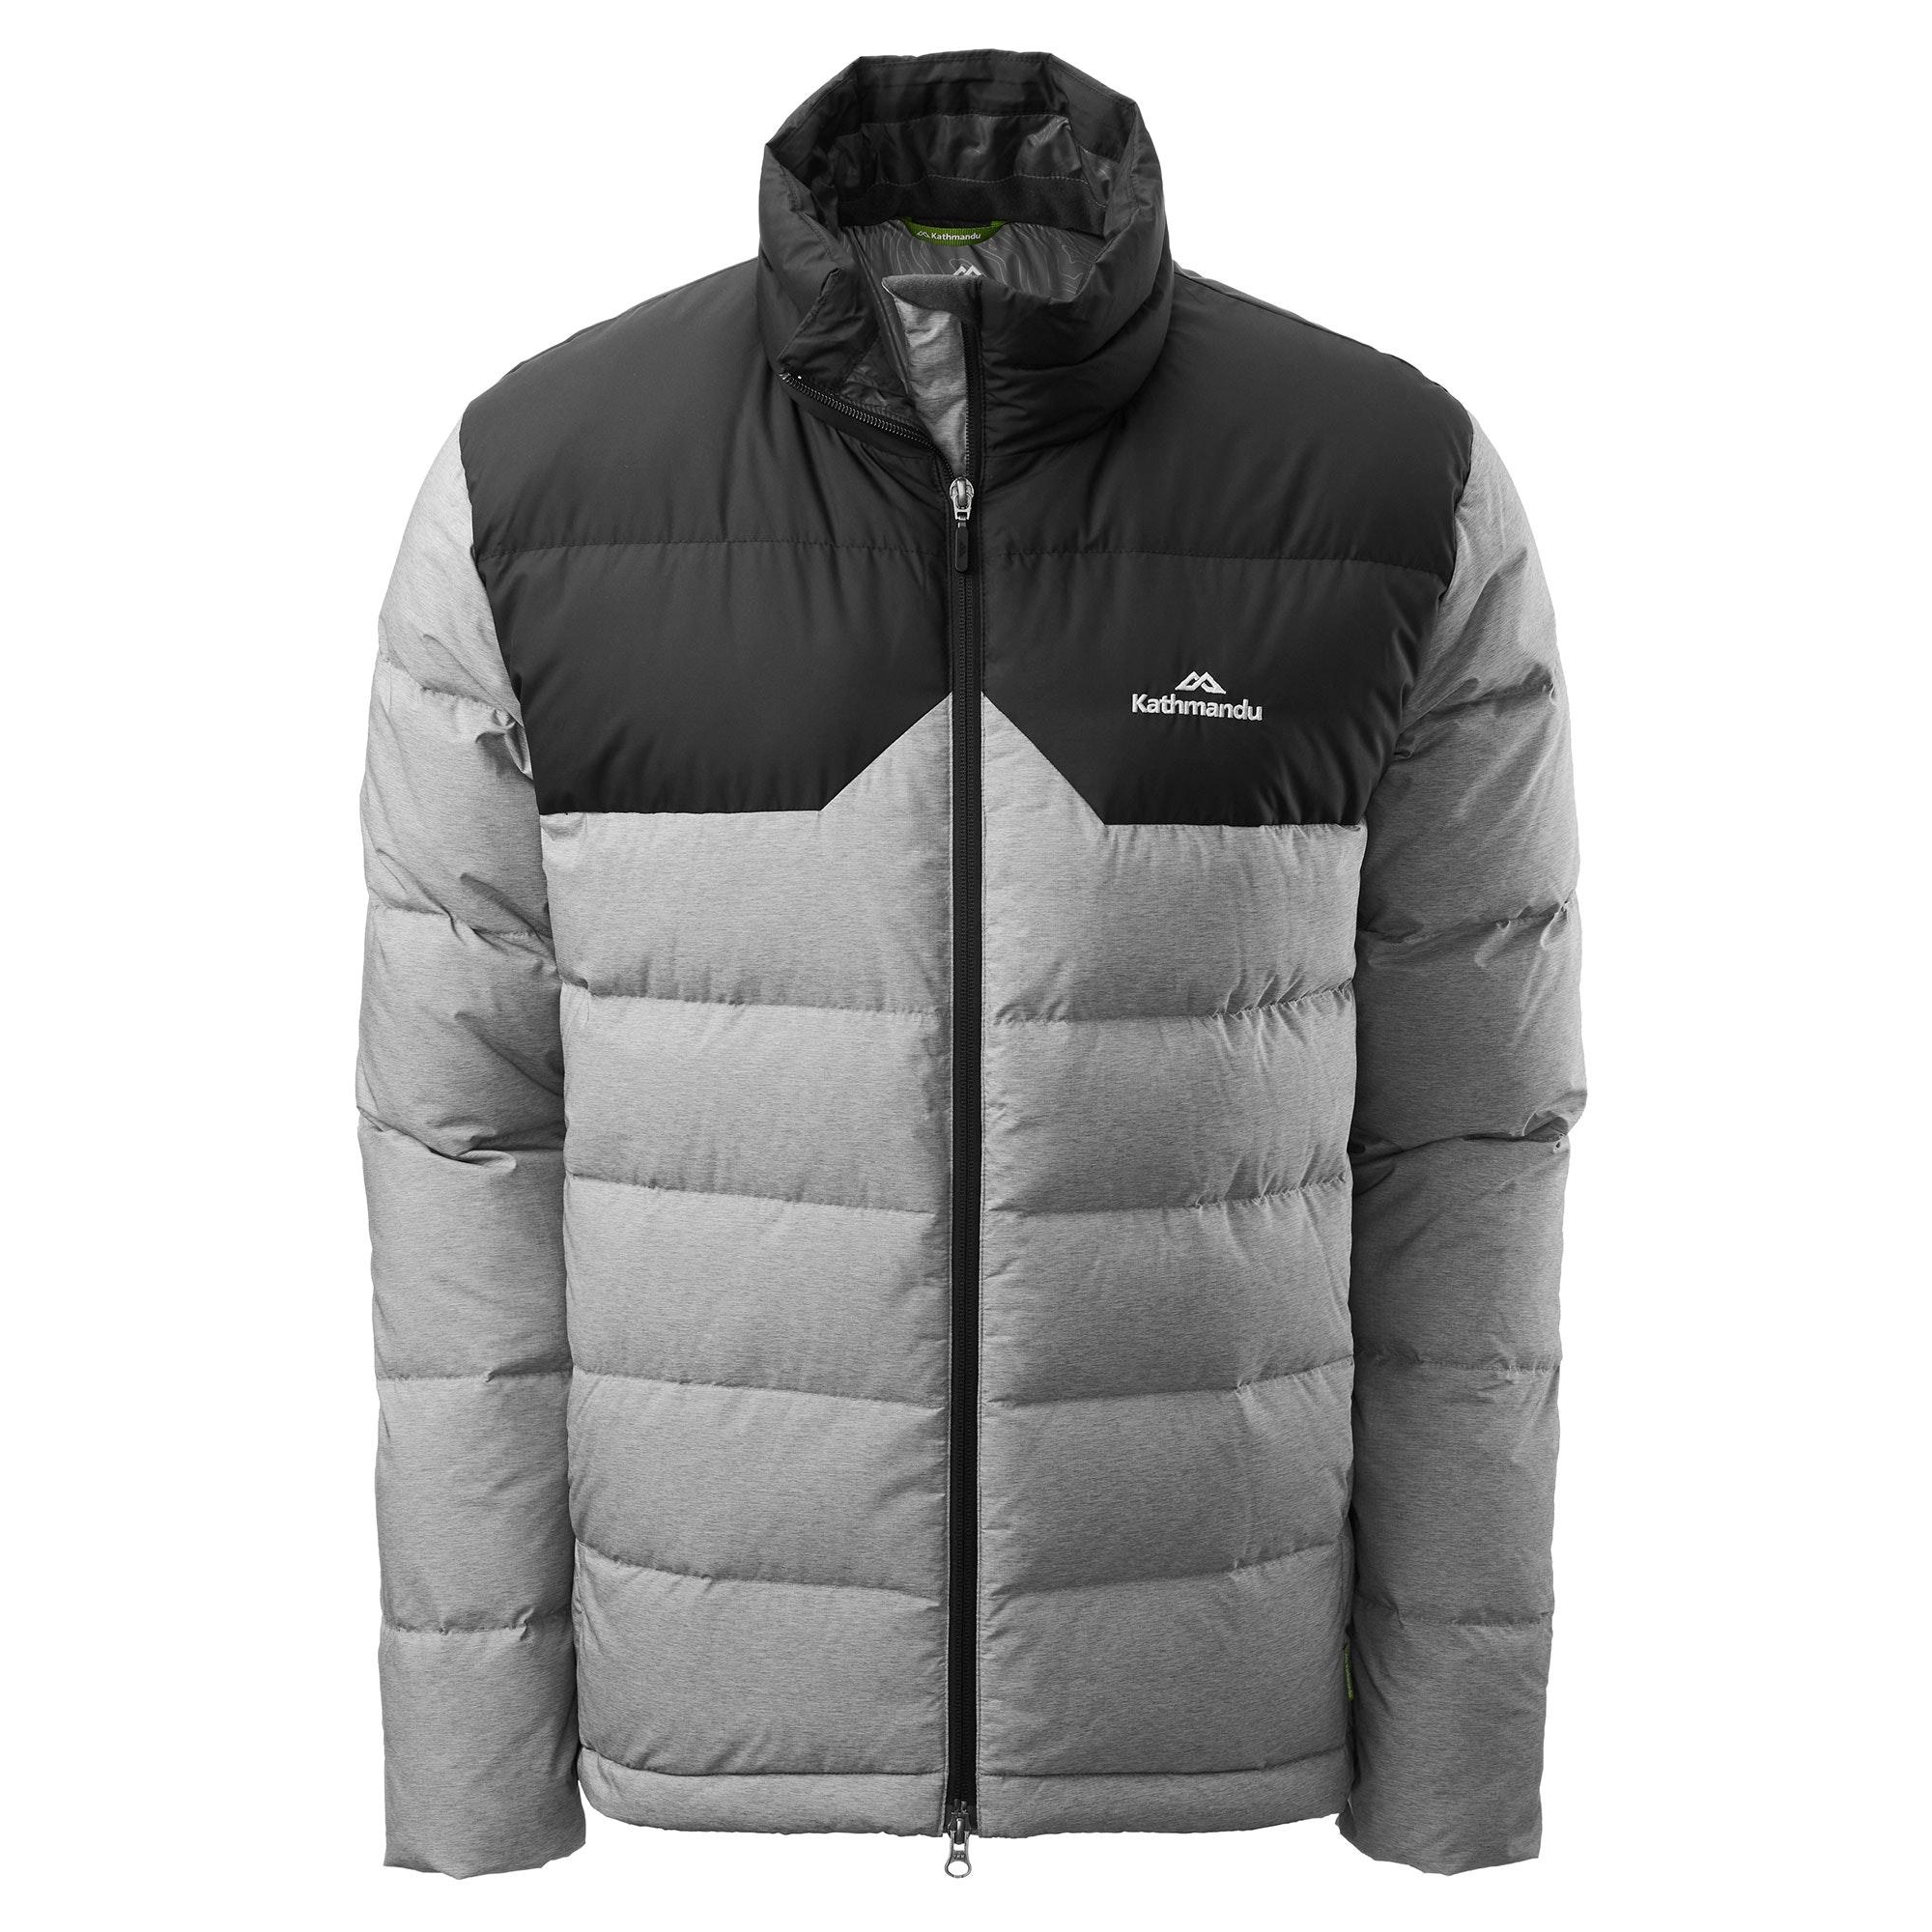 439f575e8eb Men s Puffer Jacket 550 - Kathmandu NZ